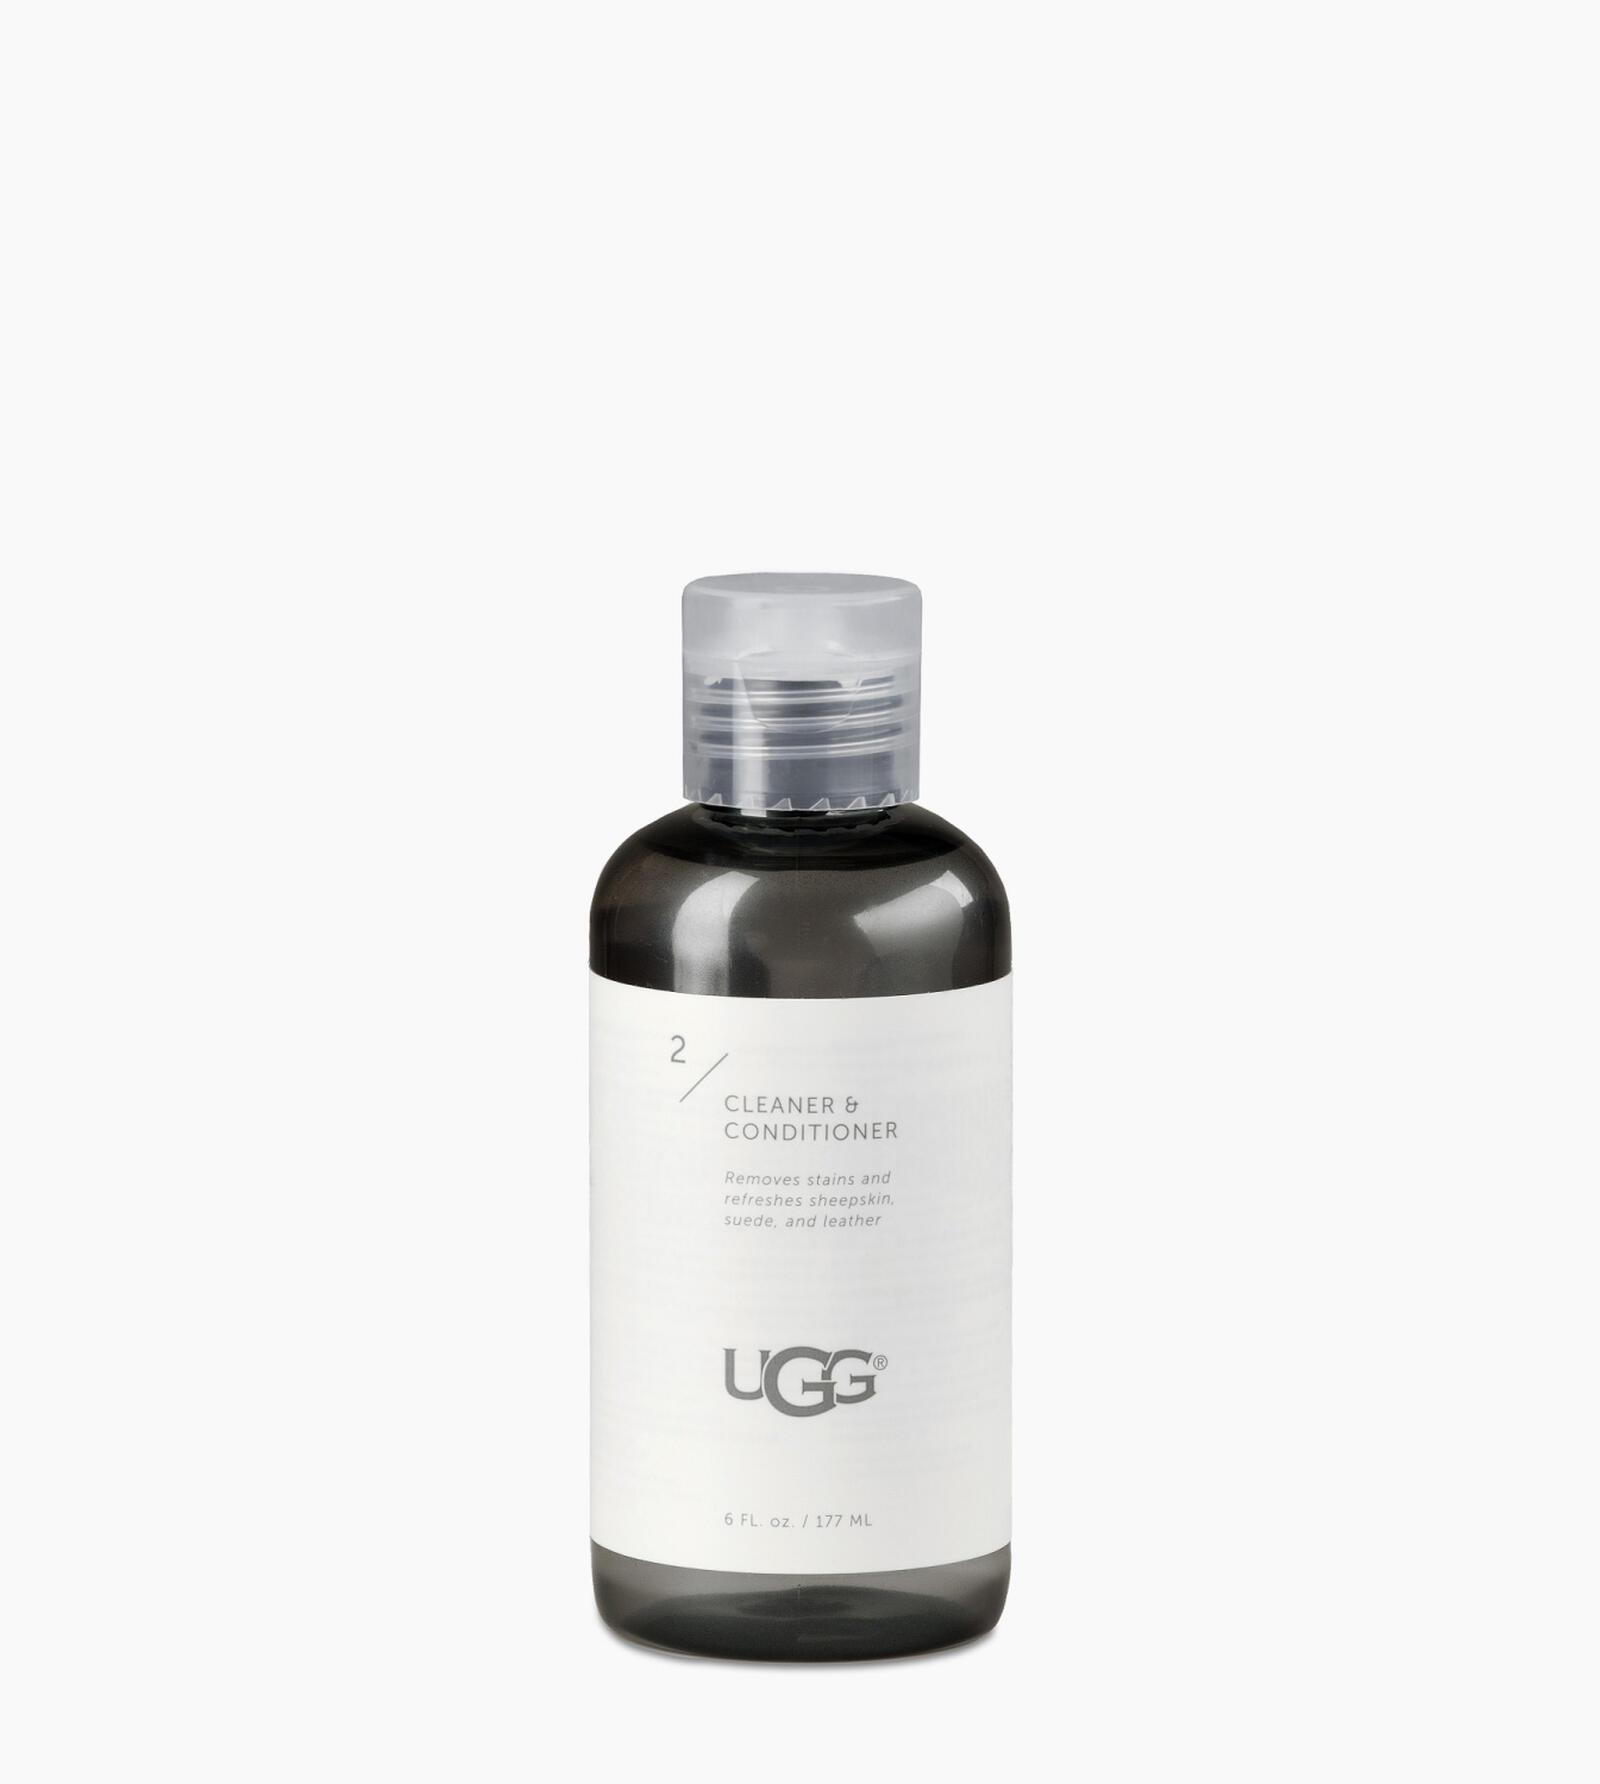 UGG Cleaner & Conditioner